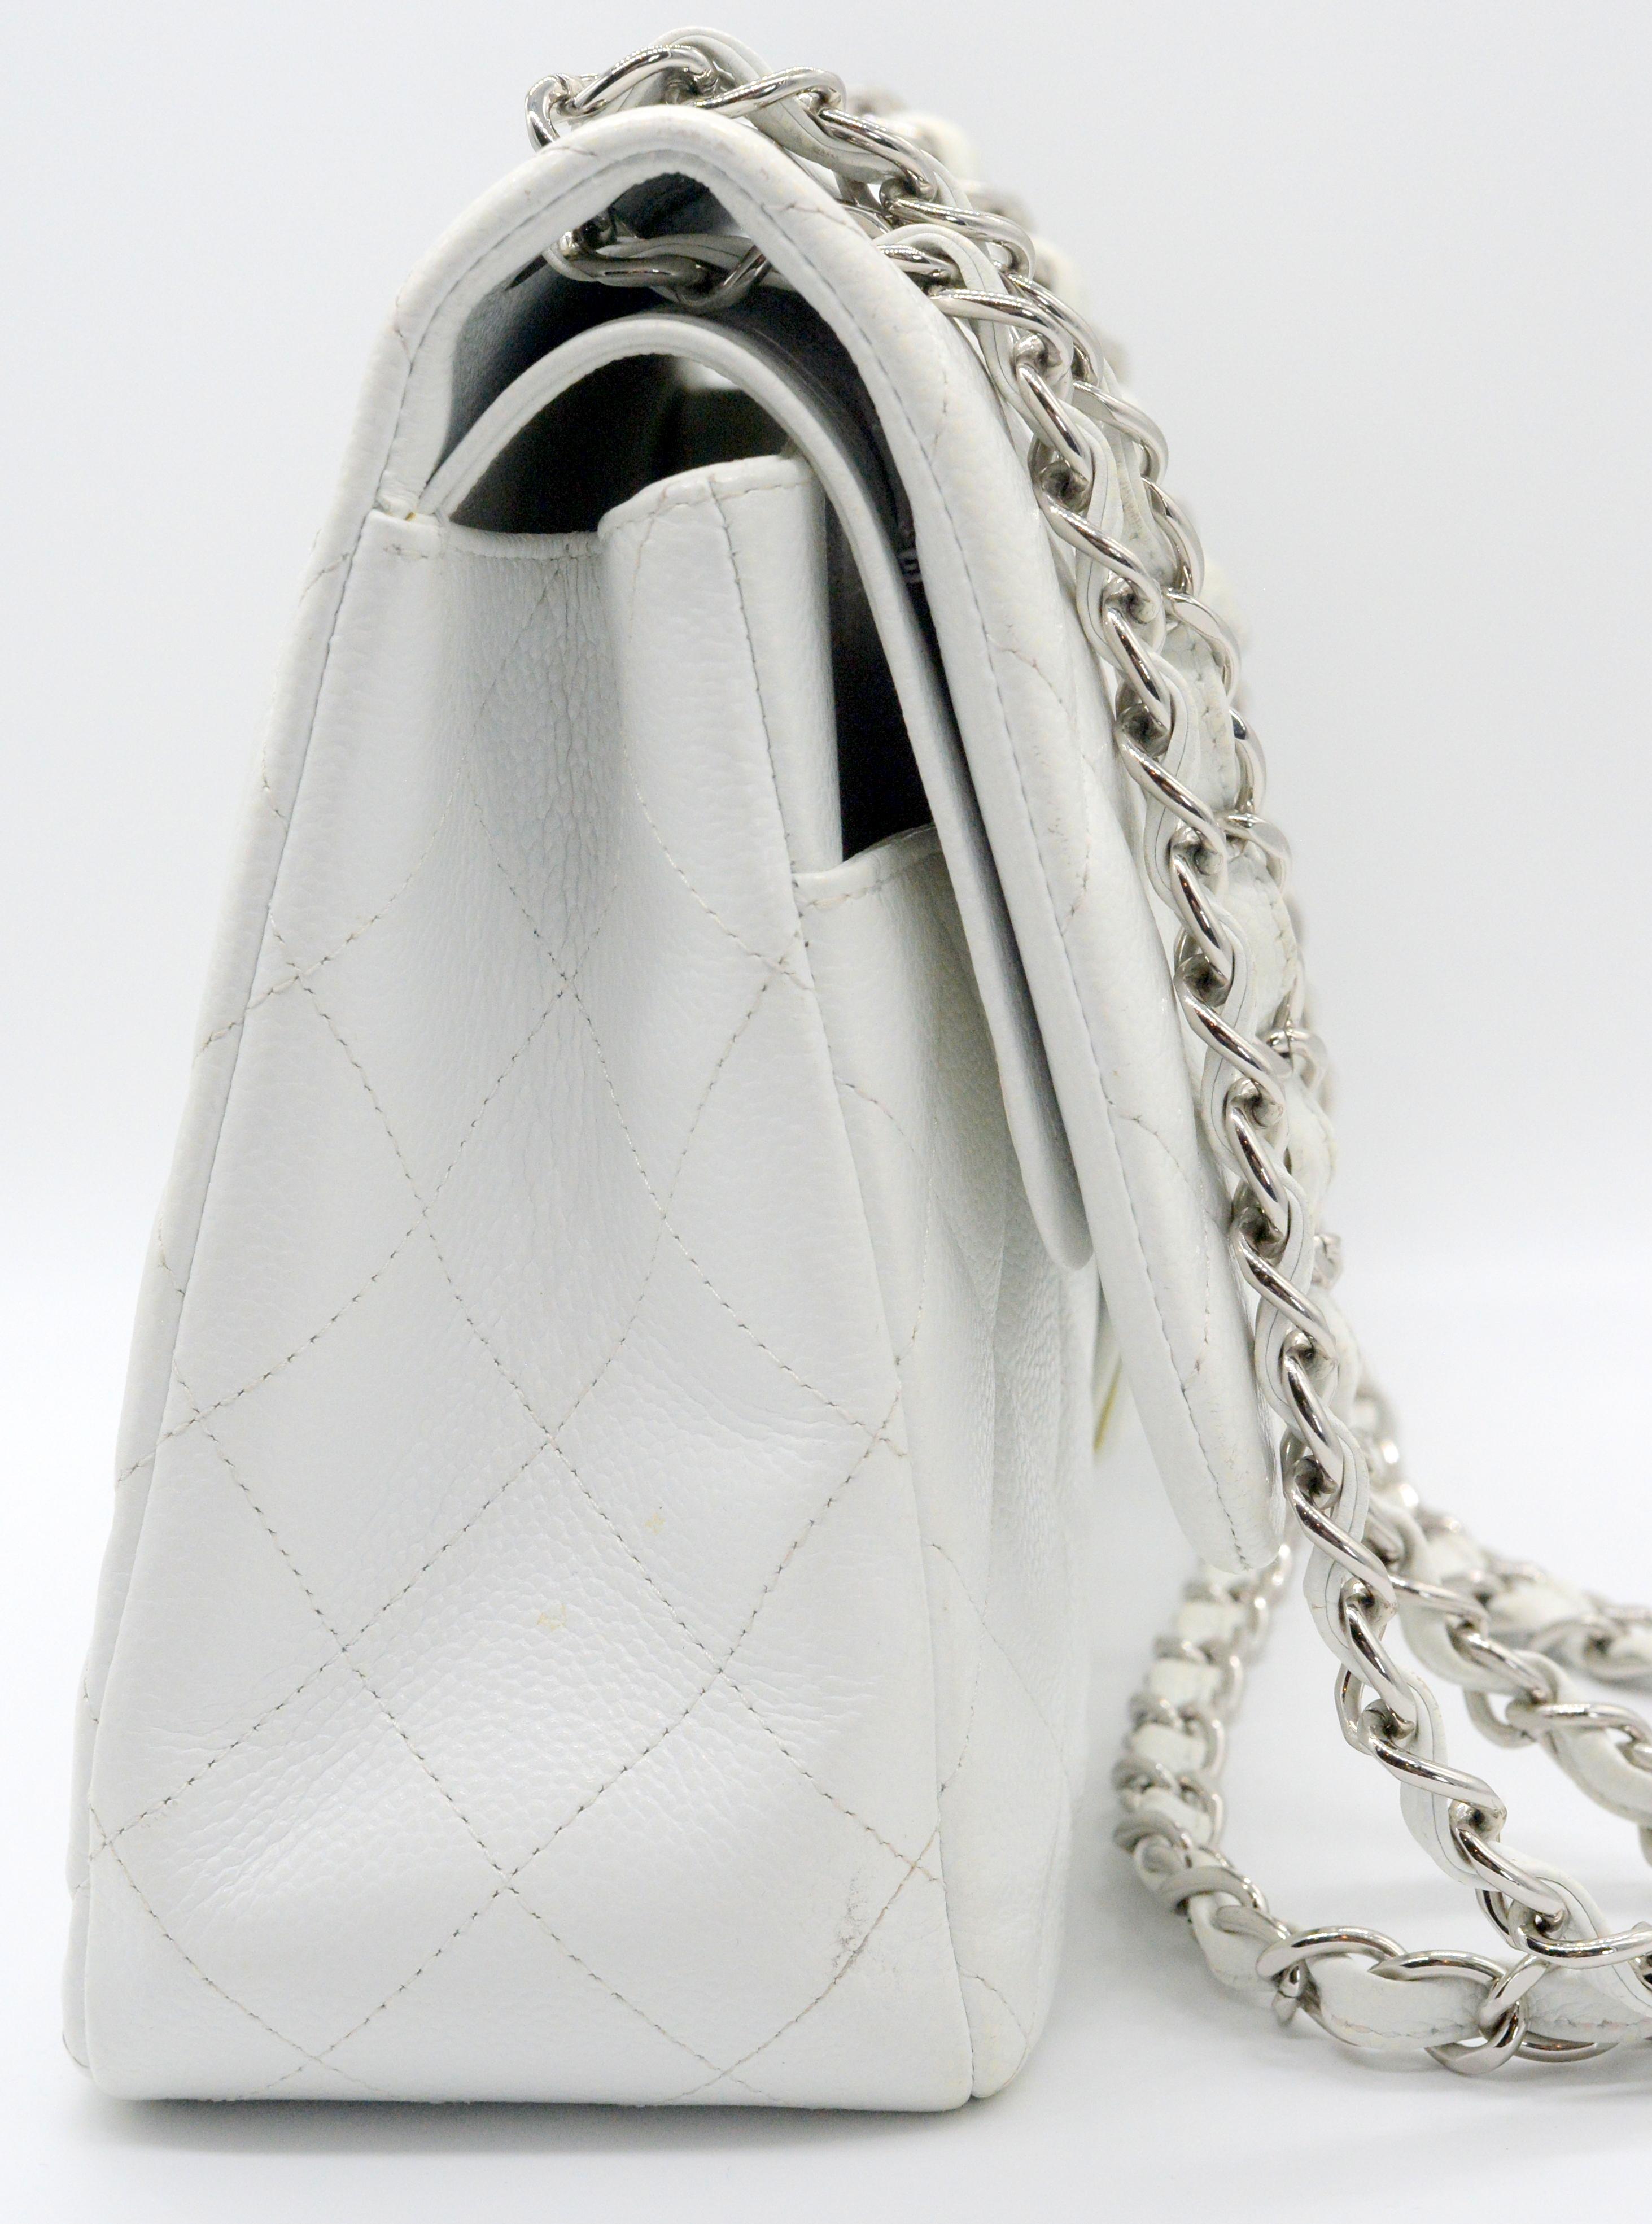 5f656f852328 Chanel White Caviar Medium Single Flap Shoulder Bag – DesignerShare